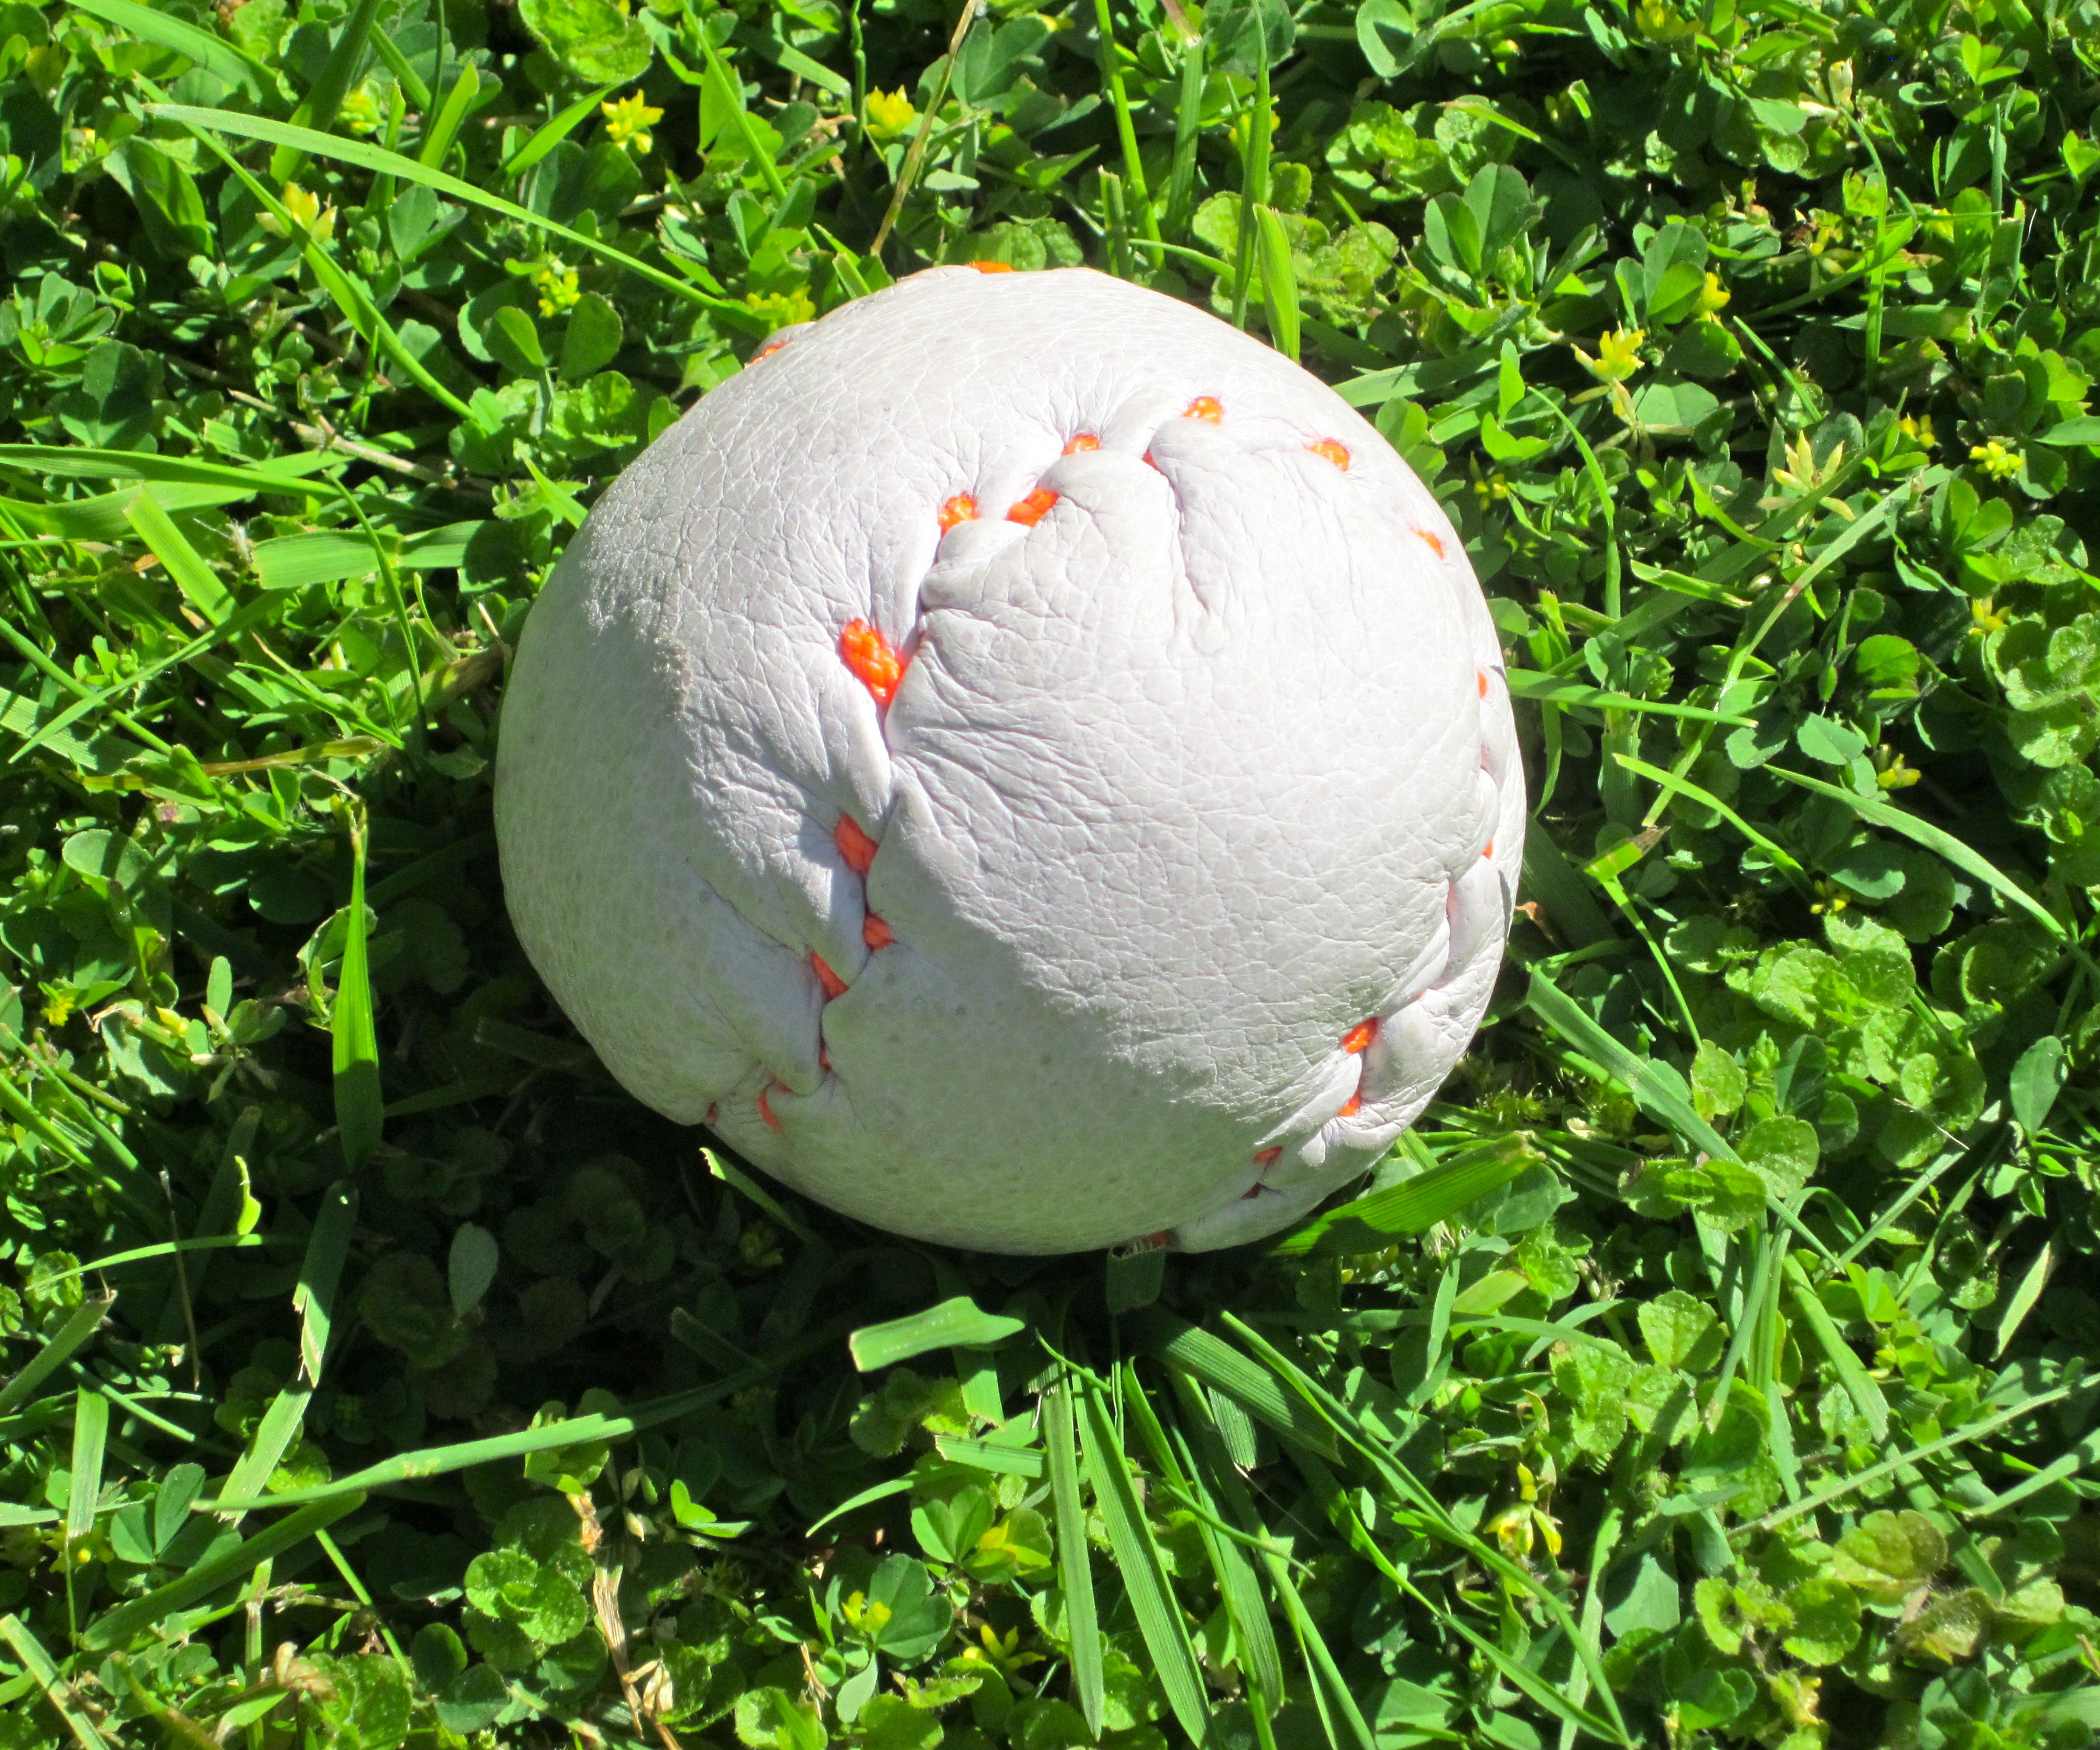 Leather Juggling Balls